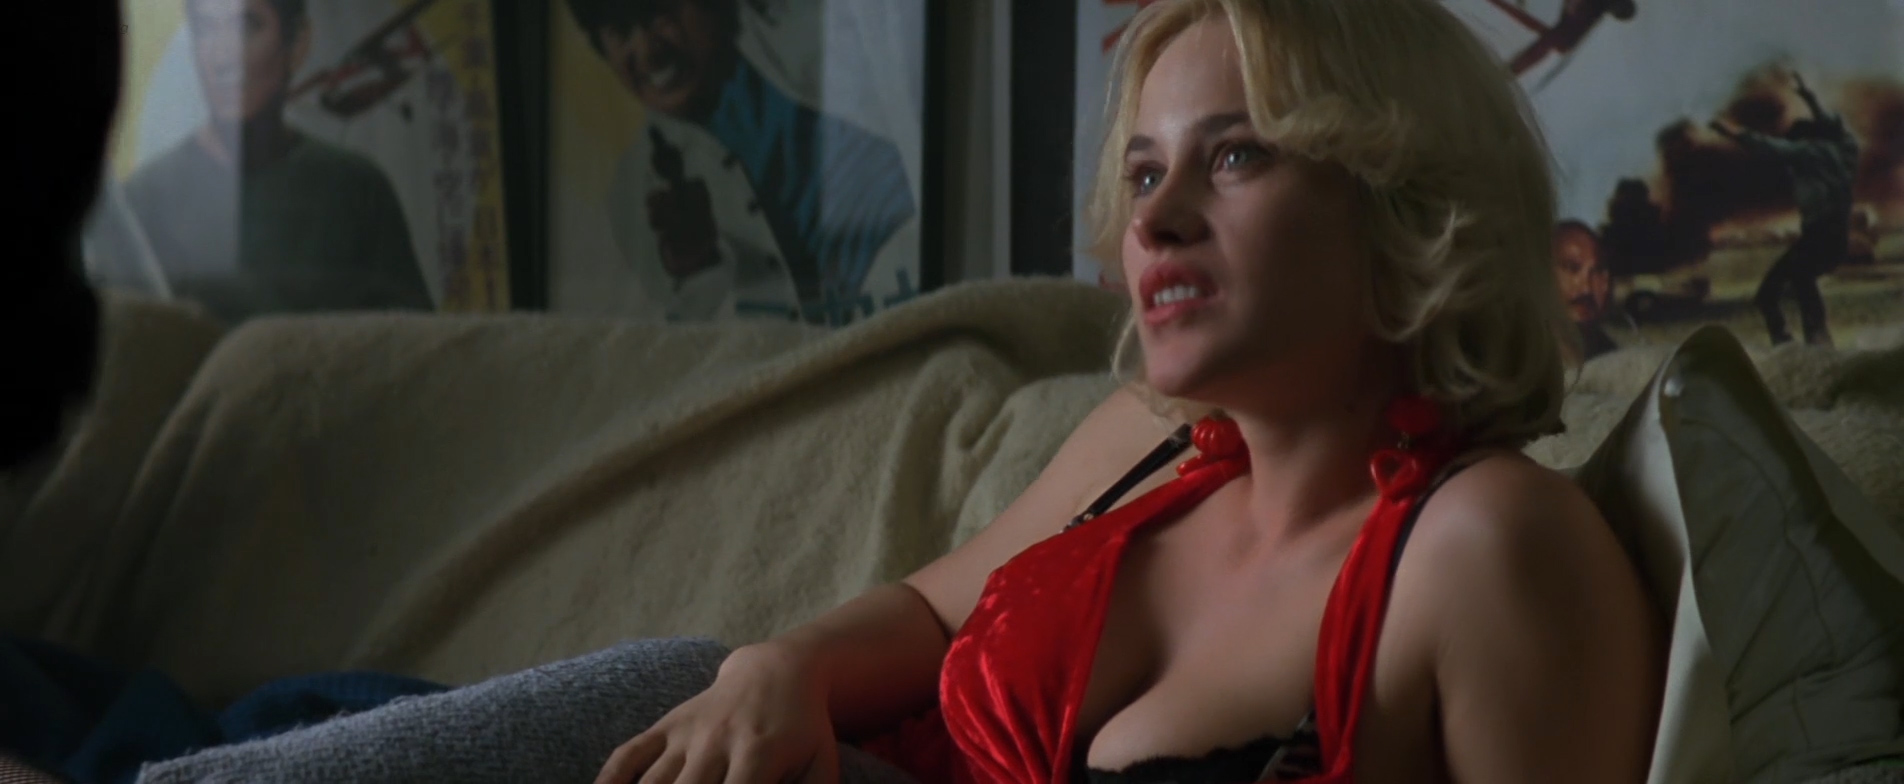 Patricia Arquette nude busty and sexy - True Romance (1993) hd1080p (3)